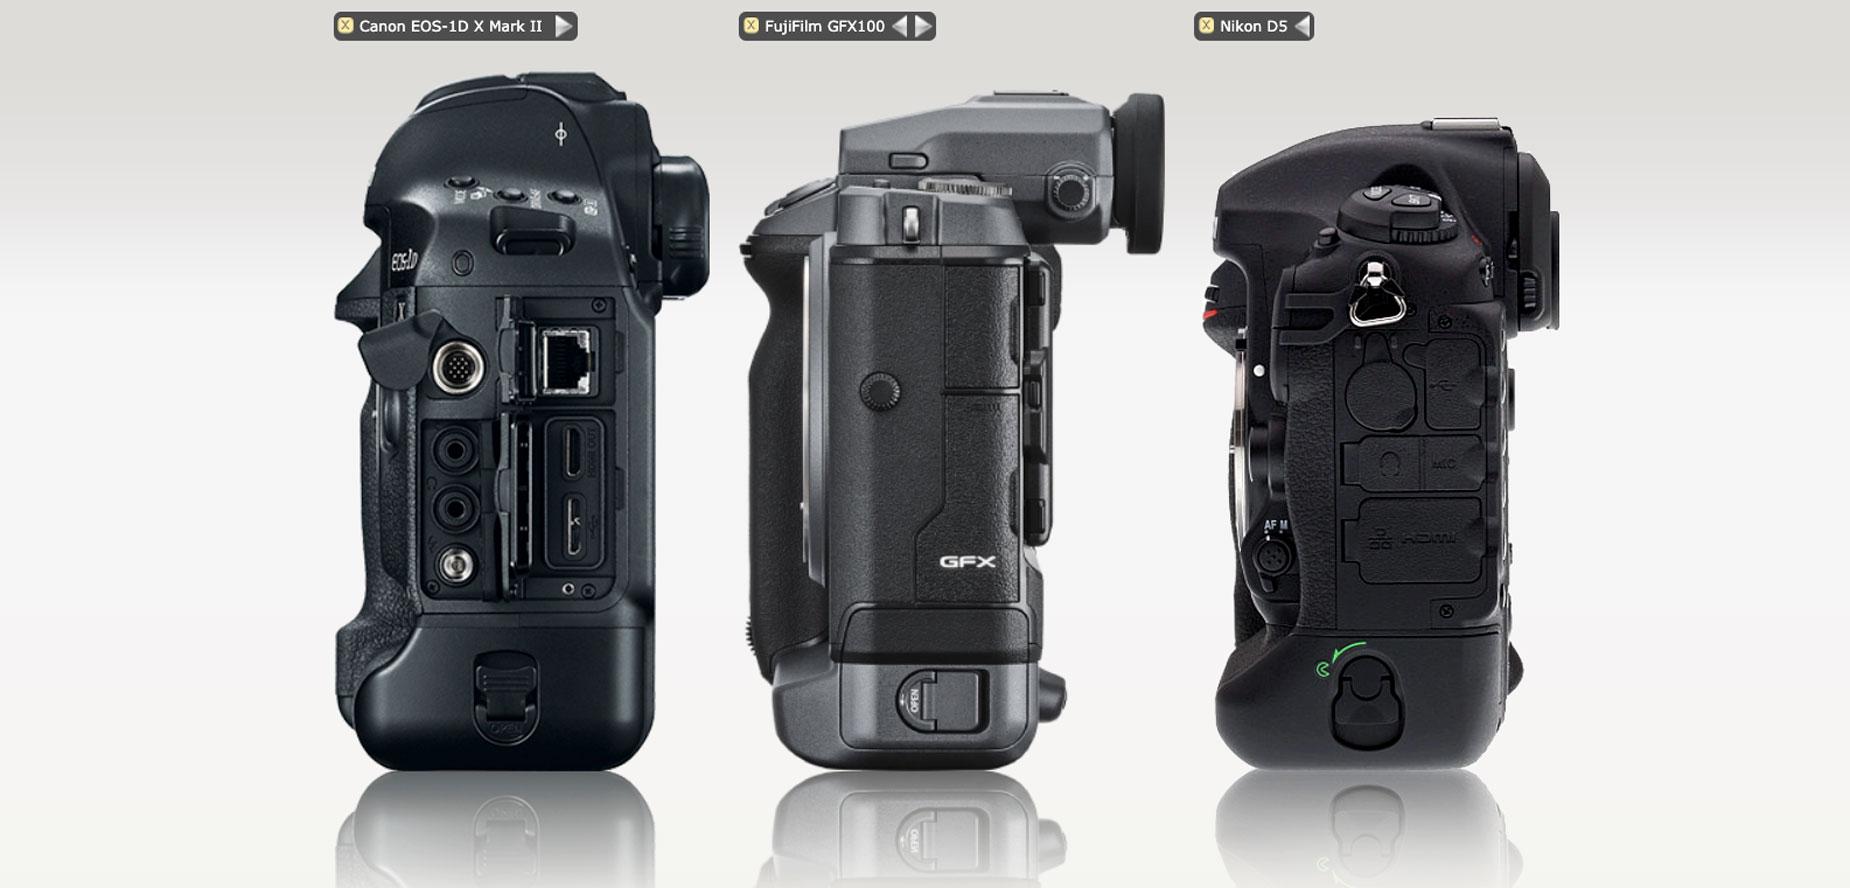 1DX-GFX100-D5-trai.jpg